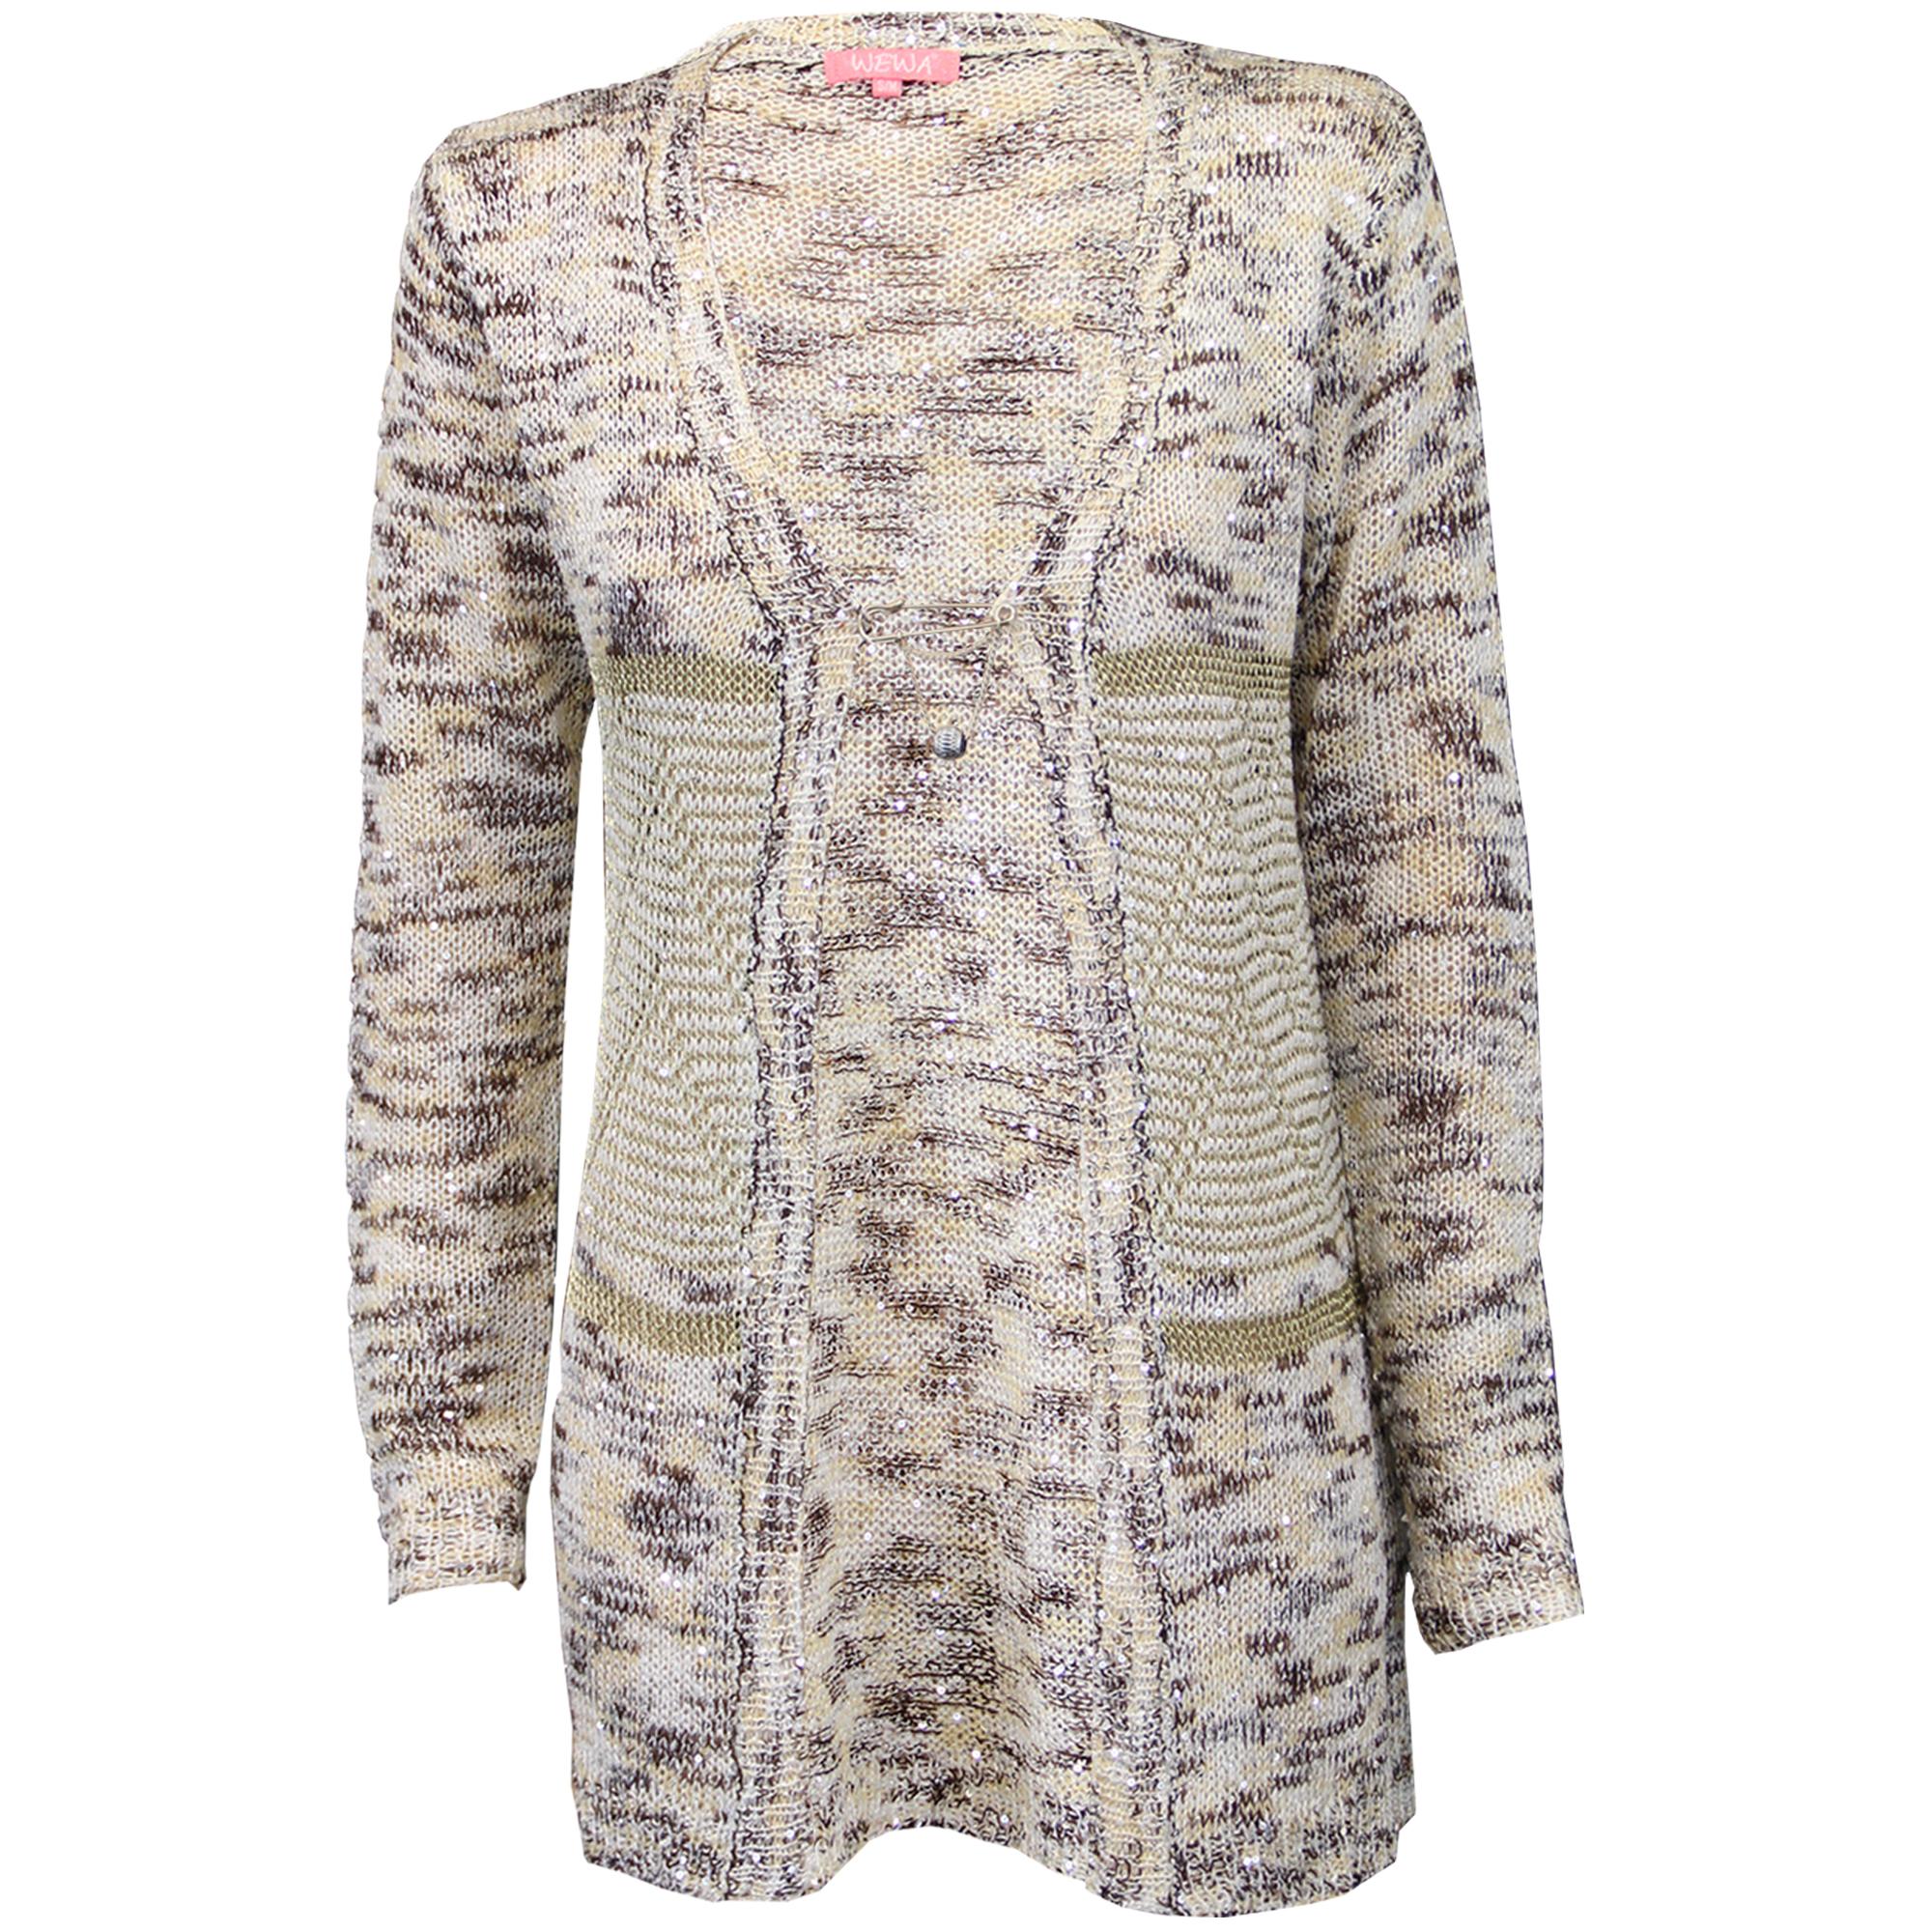 Ladies Cardigan Womens Knitted Metallic Yarn Wool Mix